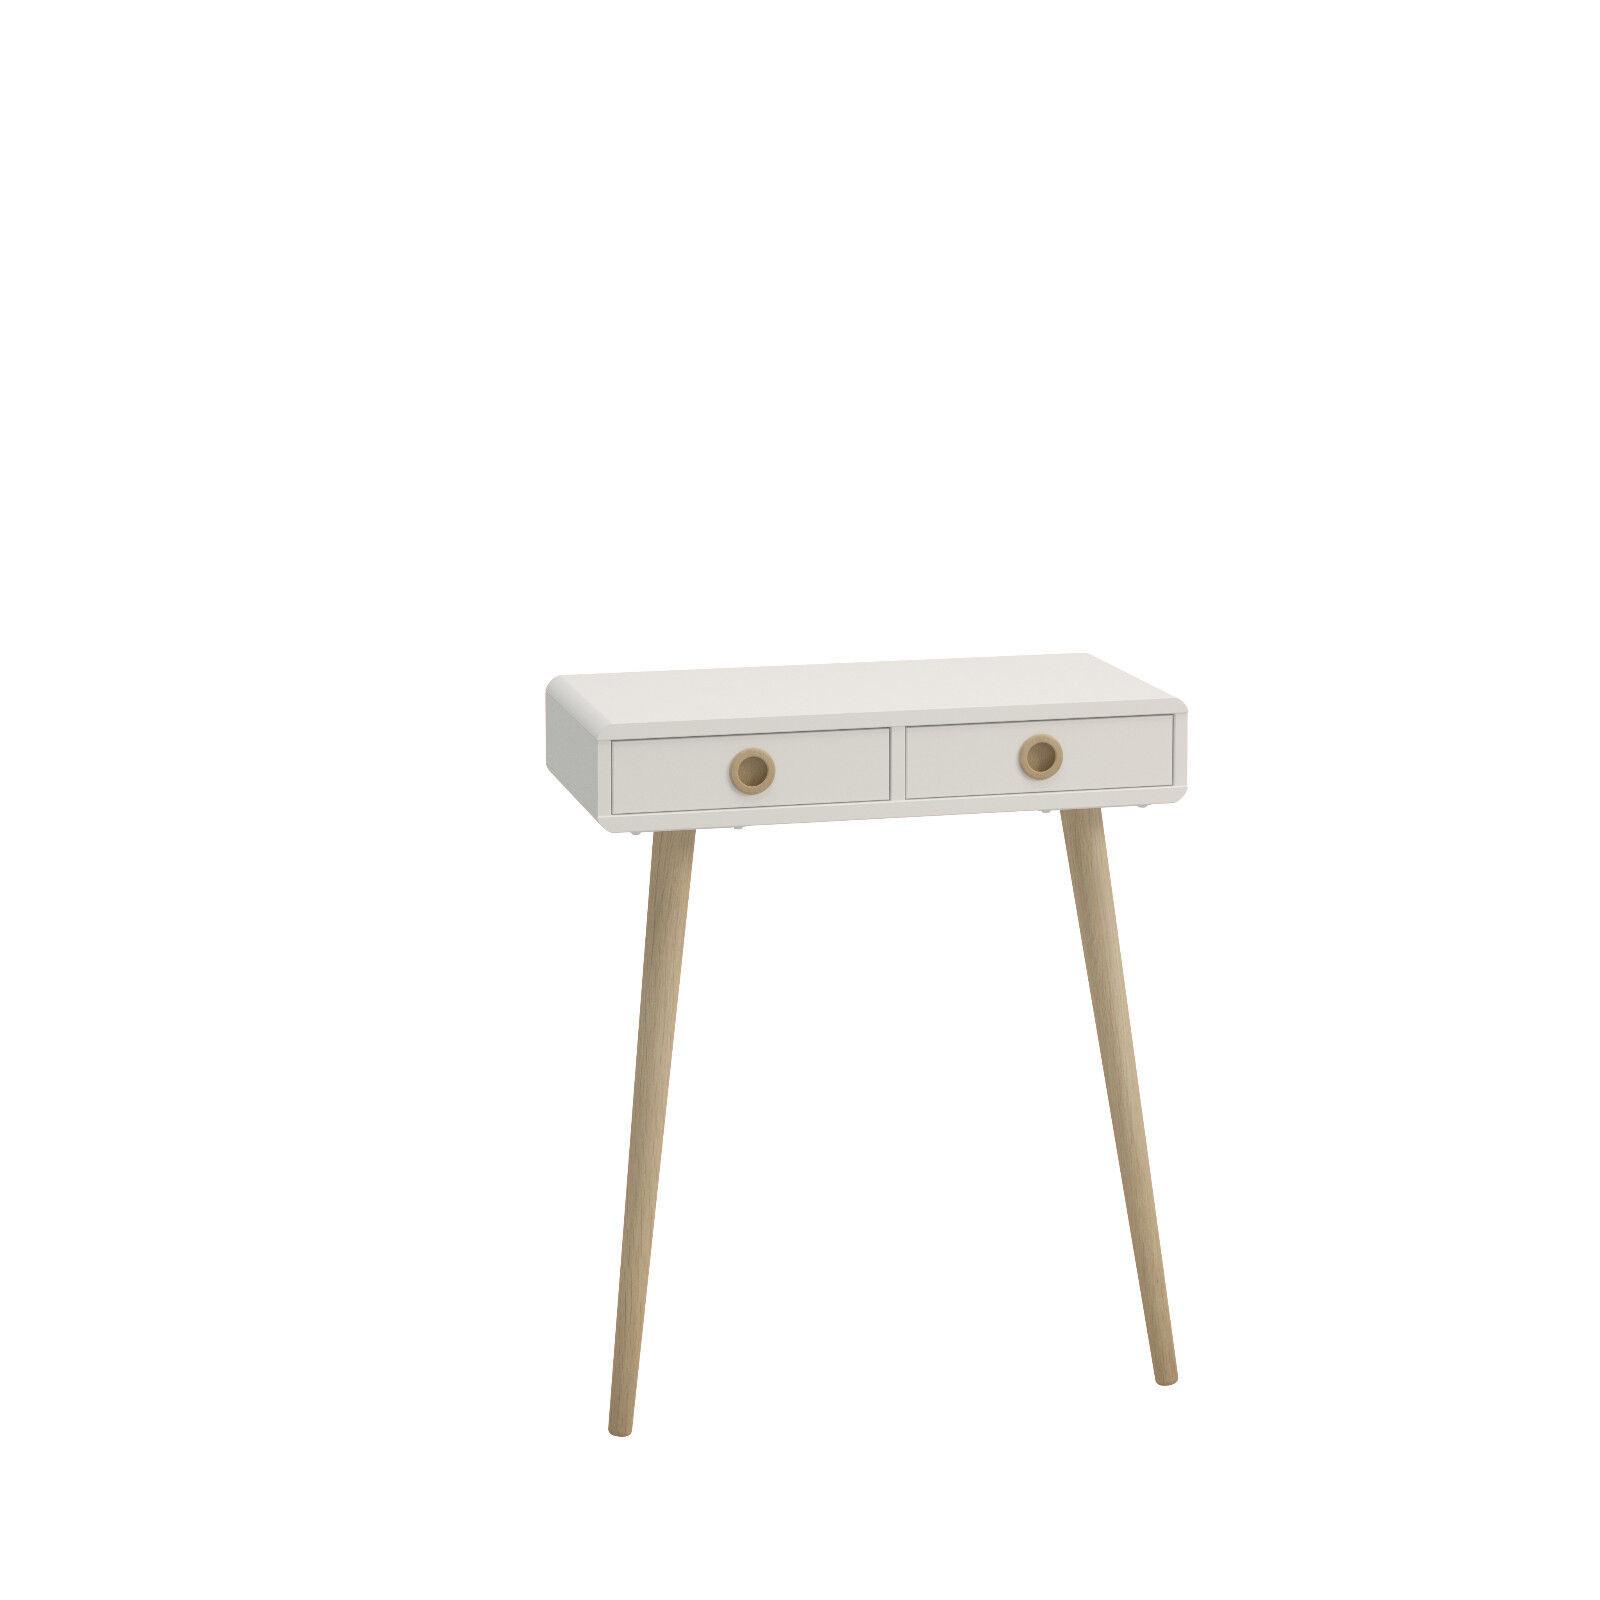 Details About Retro White Painted Low 2 Drawer Console Table 65cm 30cm 76cm